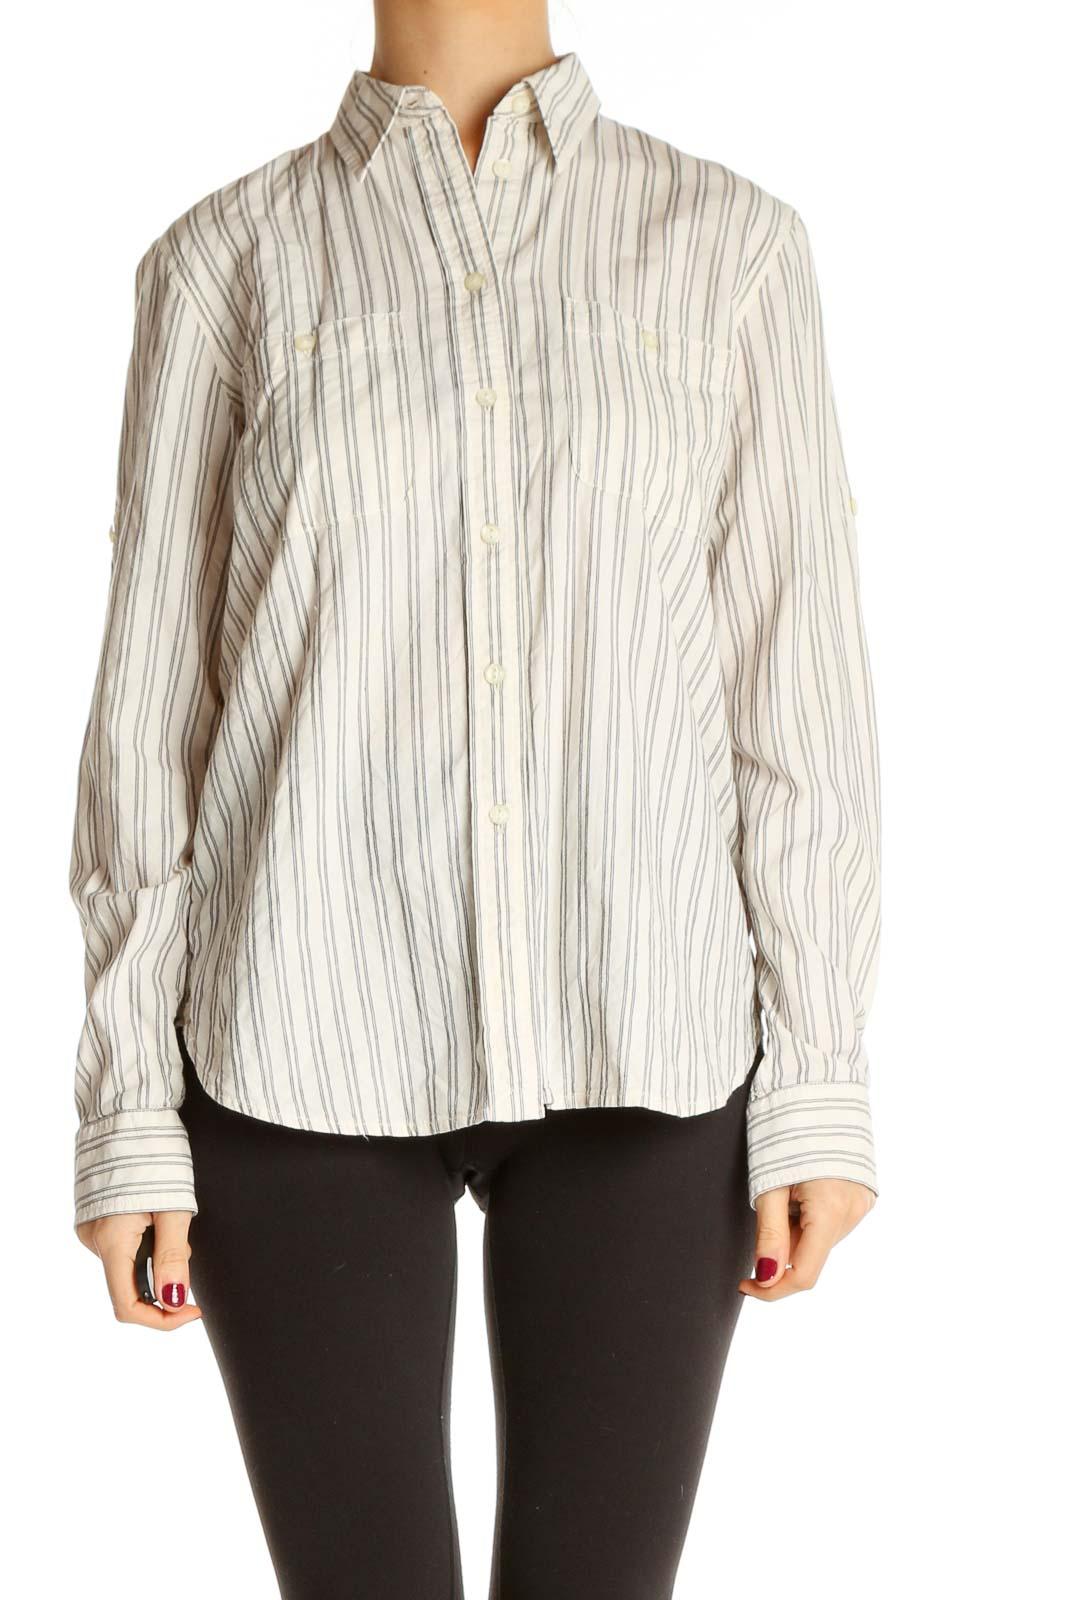 Beige Striped Formal Shirt Front